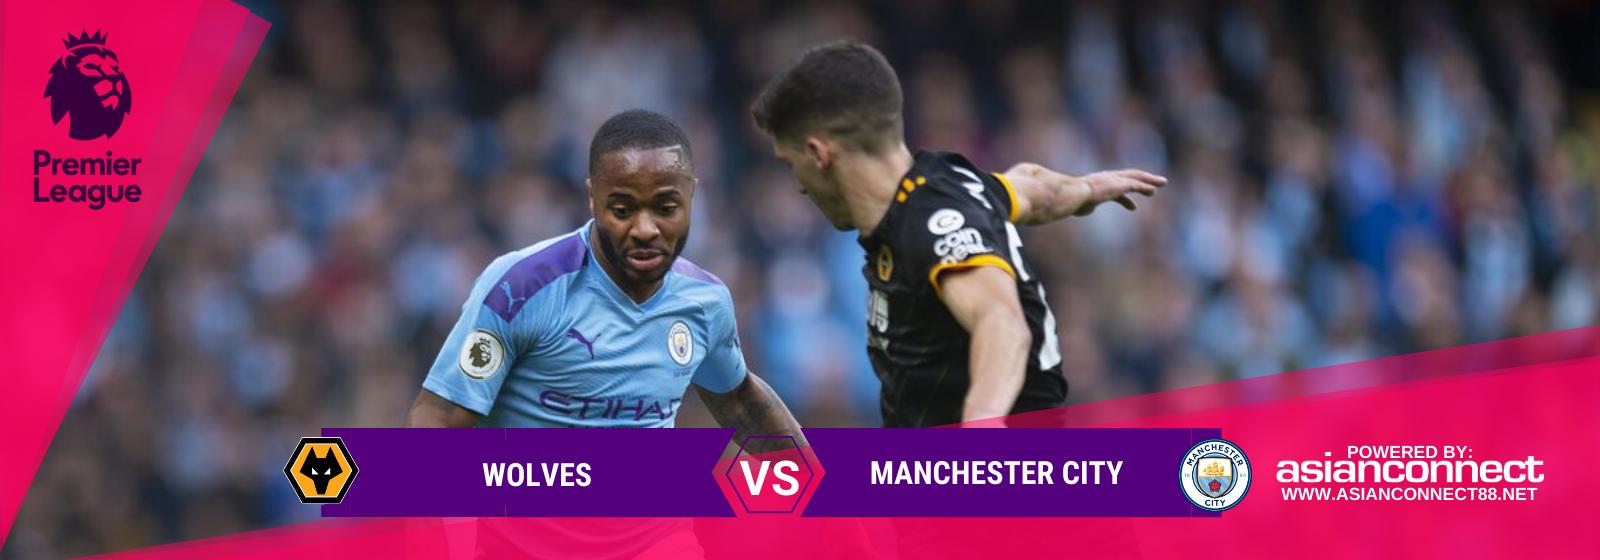 Asianconnect: Wolves vs Manchester City